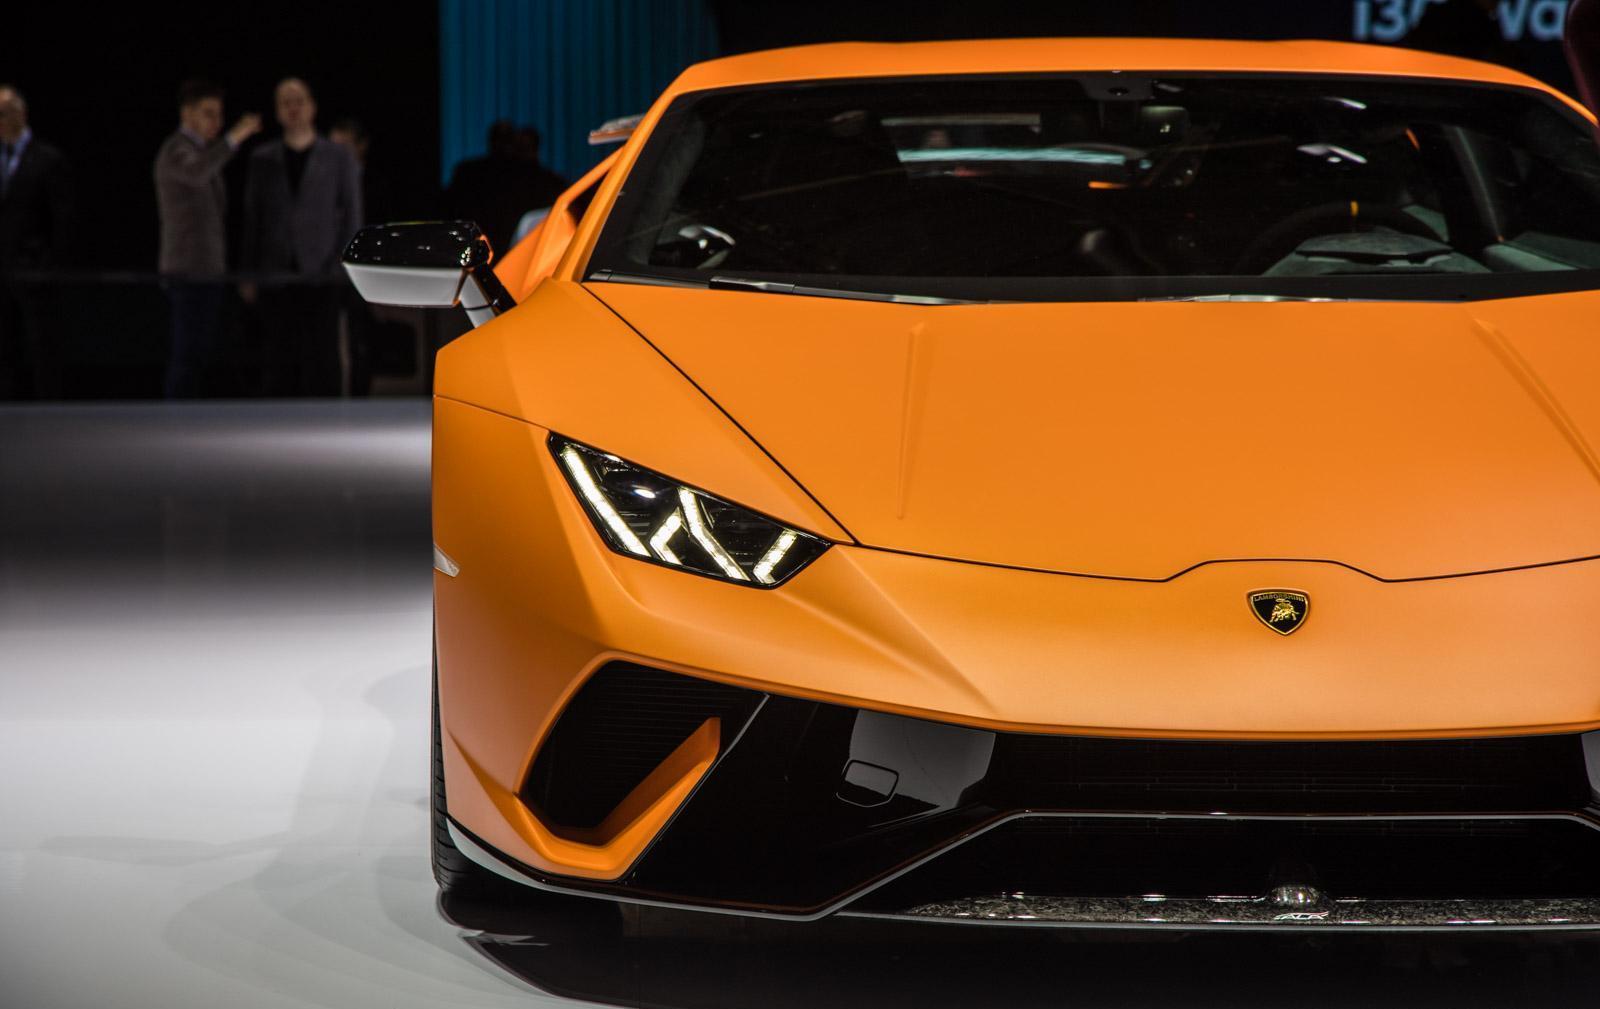 Lamborghini-Huracan-Performante-007